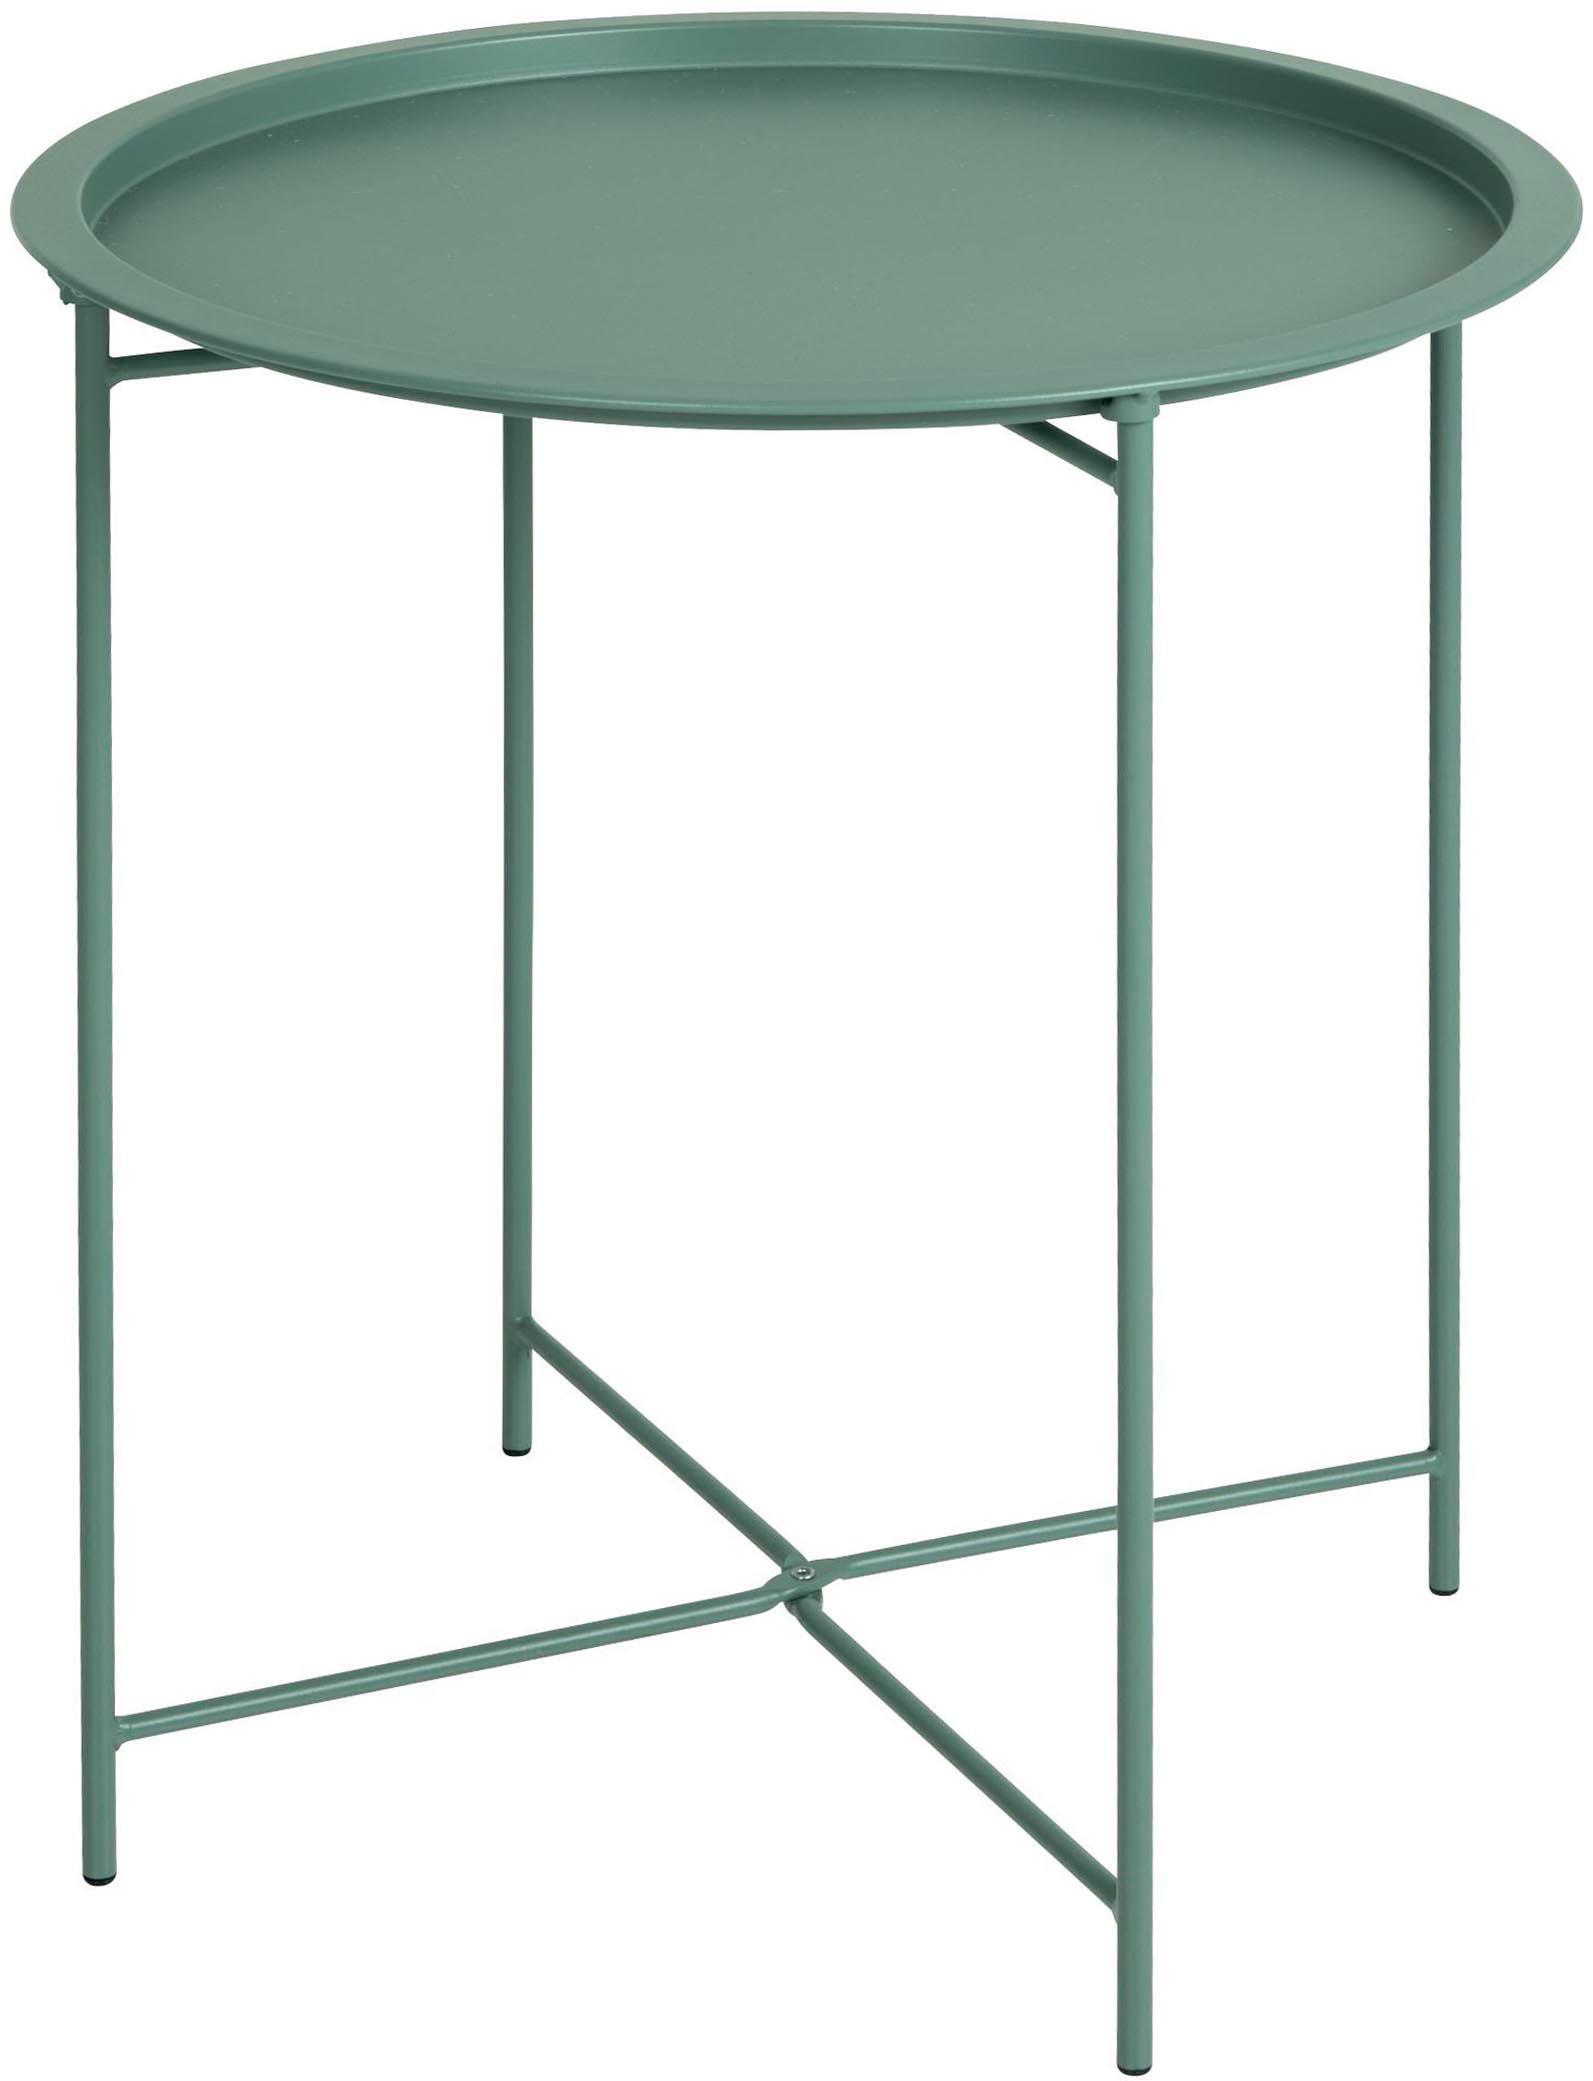 Dienbladtafel Sangro van metaal, Gepoedercoat metaal, Groen, Ø 46 x H 52 cm